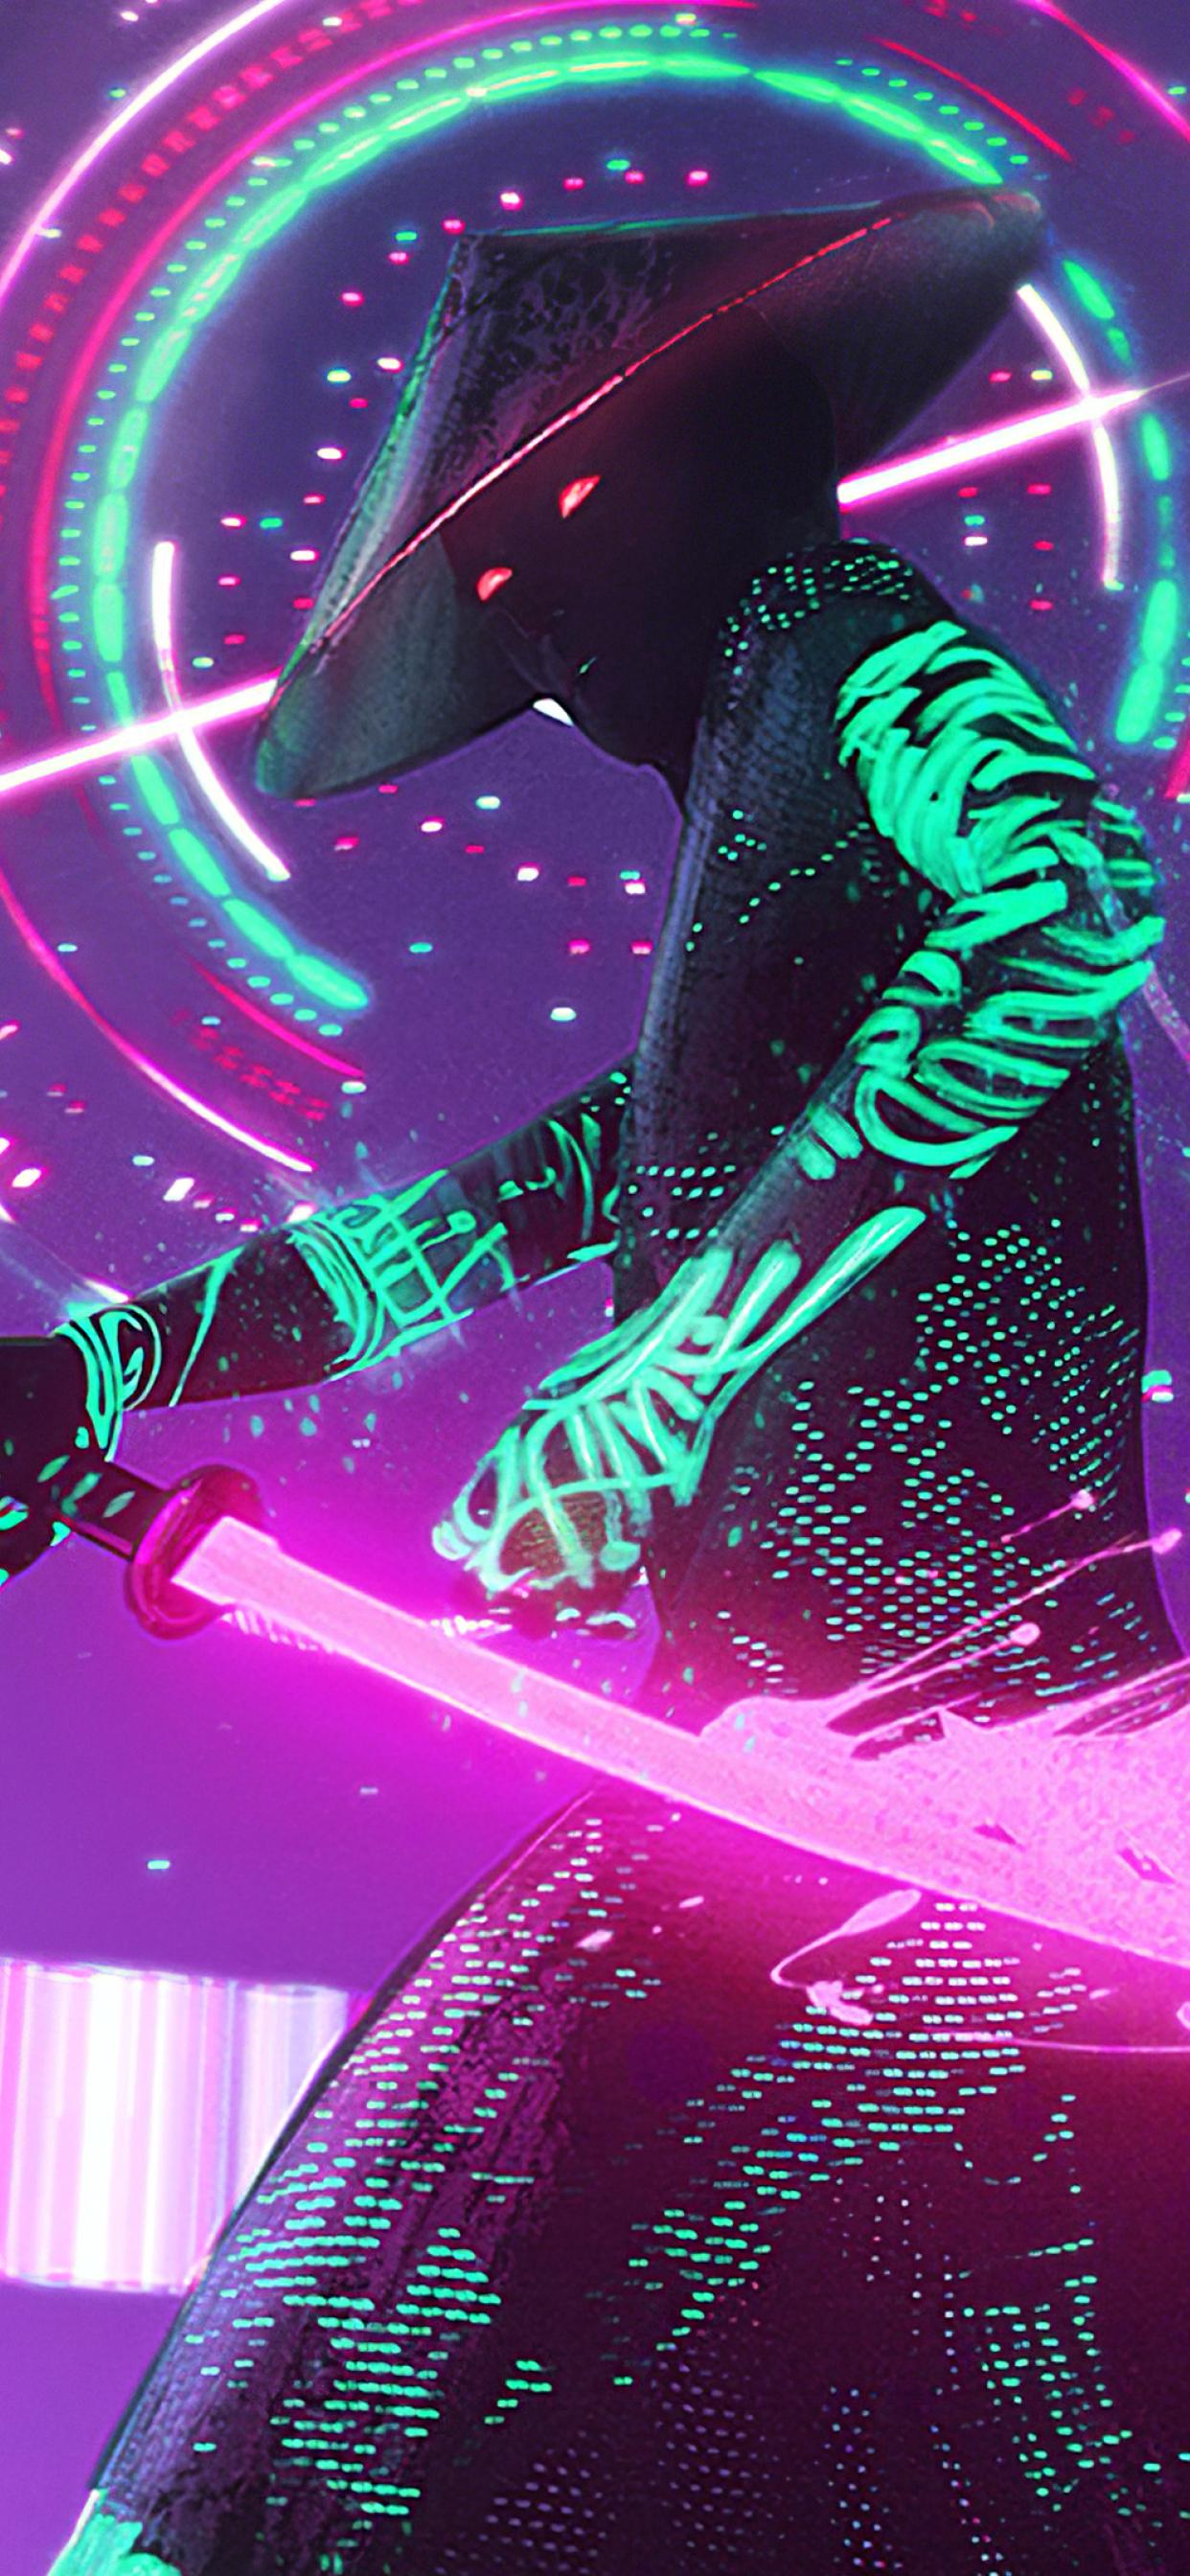 1242x2688 Neon Samurai Cyberpunk Iphone XS MAX Wallpaper ...